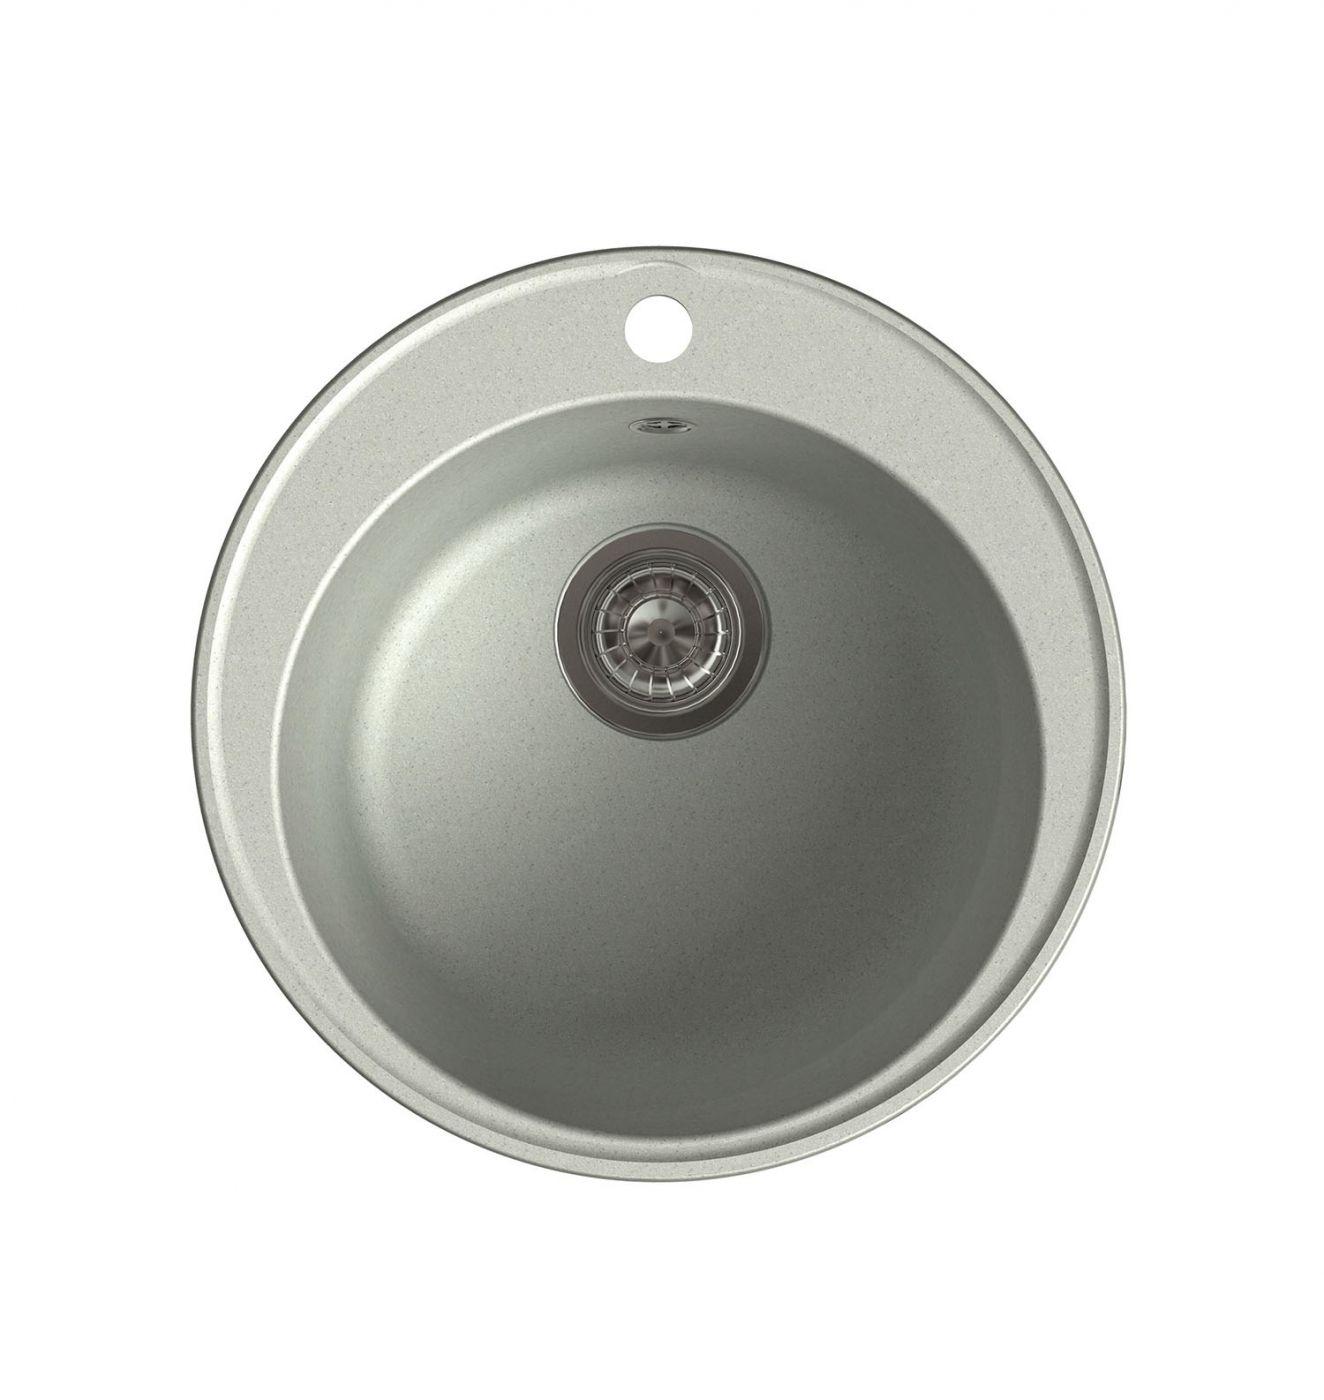 Врезная кухонная мойка LEX Lugano 480 Space Gray  48х48см полимер RULE000006